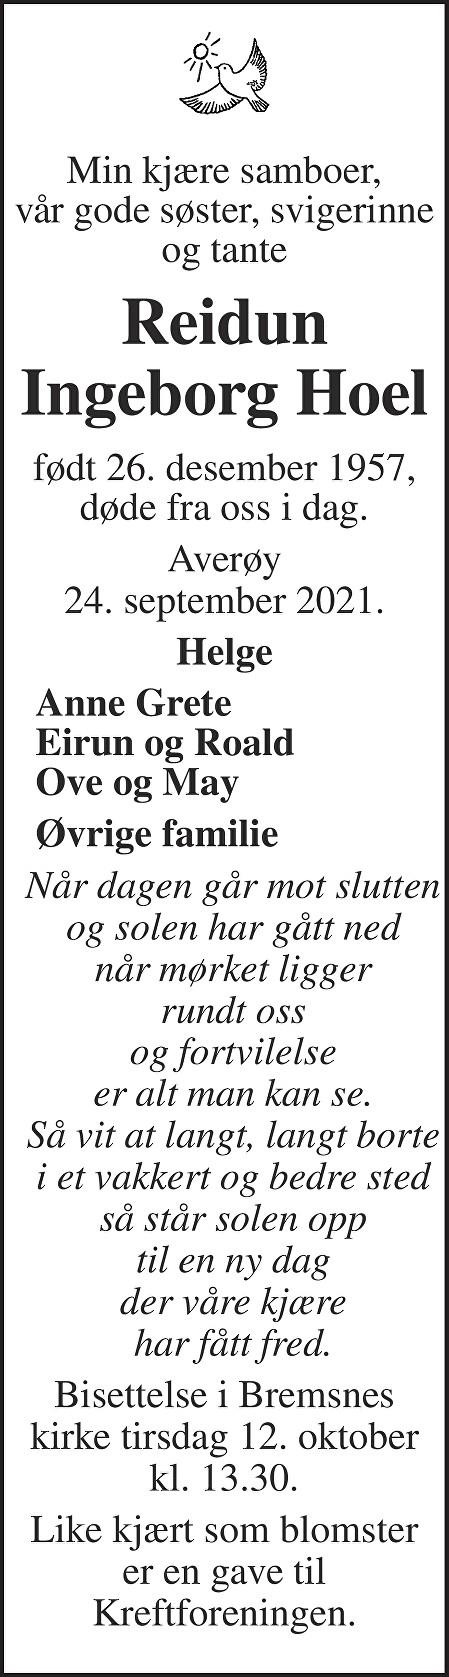 Reidun Ingeborg Hoel Dødsannonse